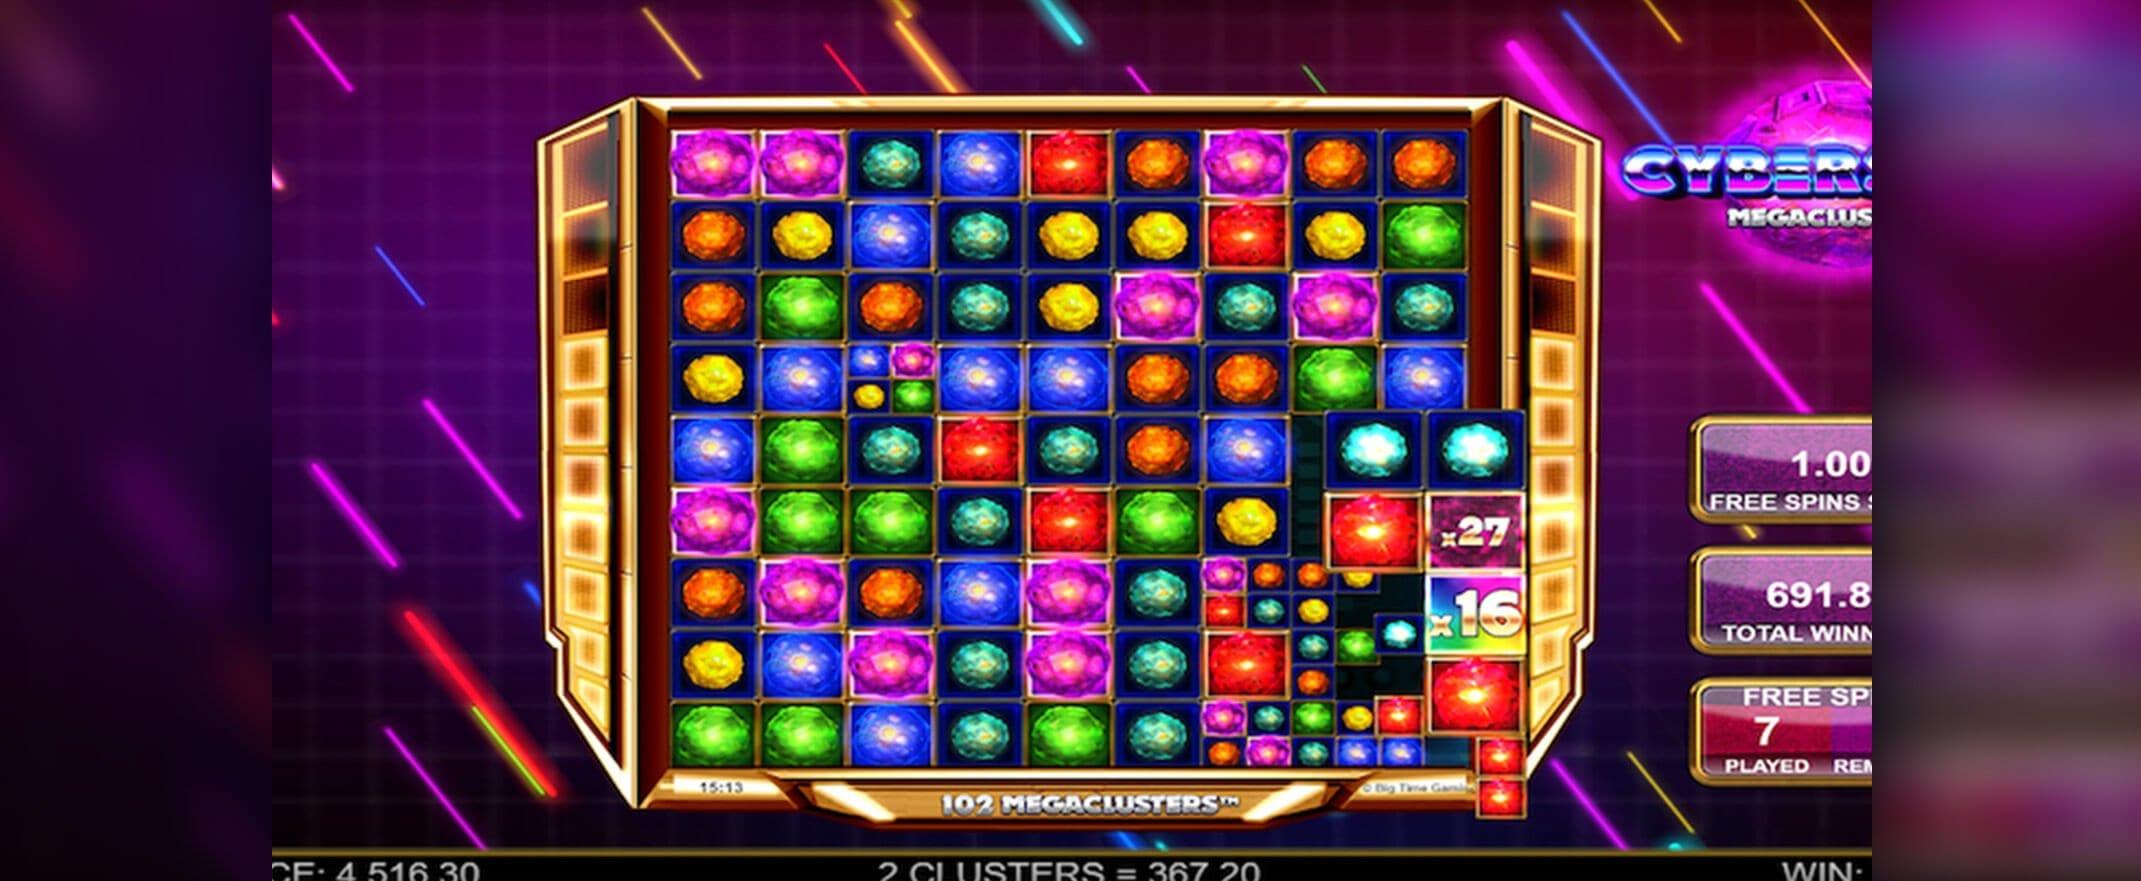 Megaclusters & Megaways slot machines